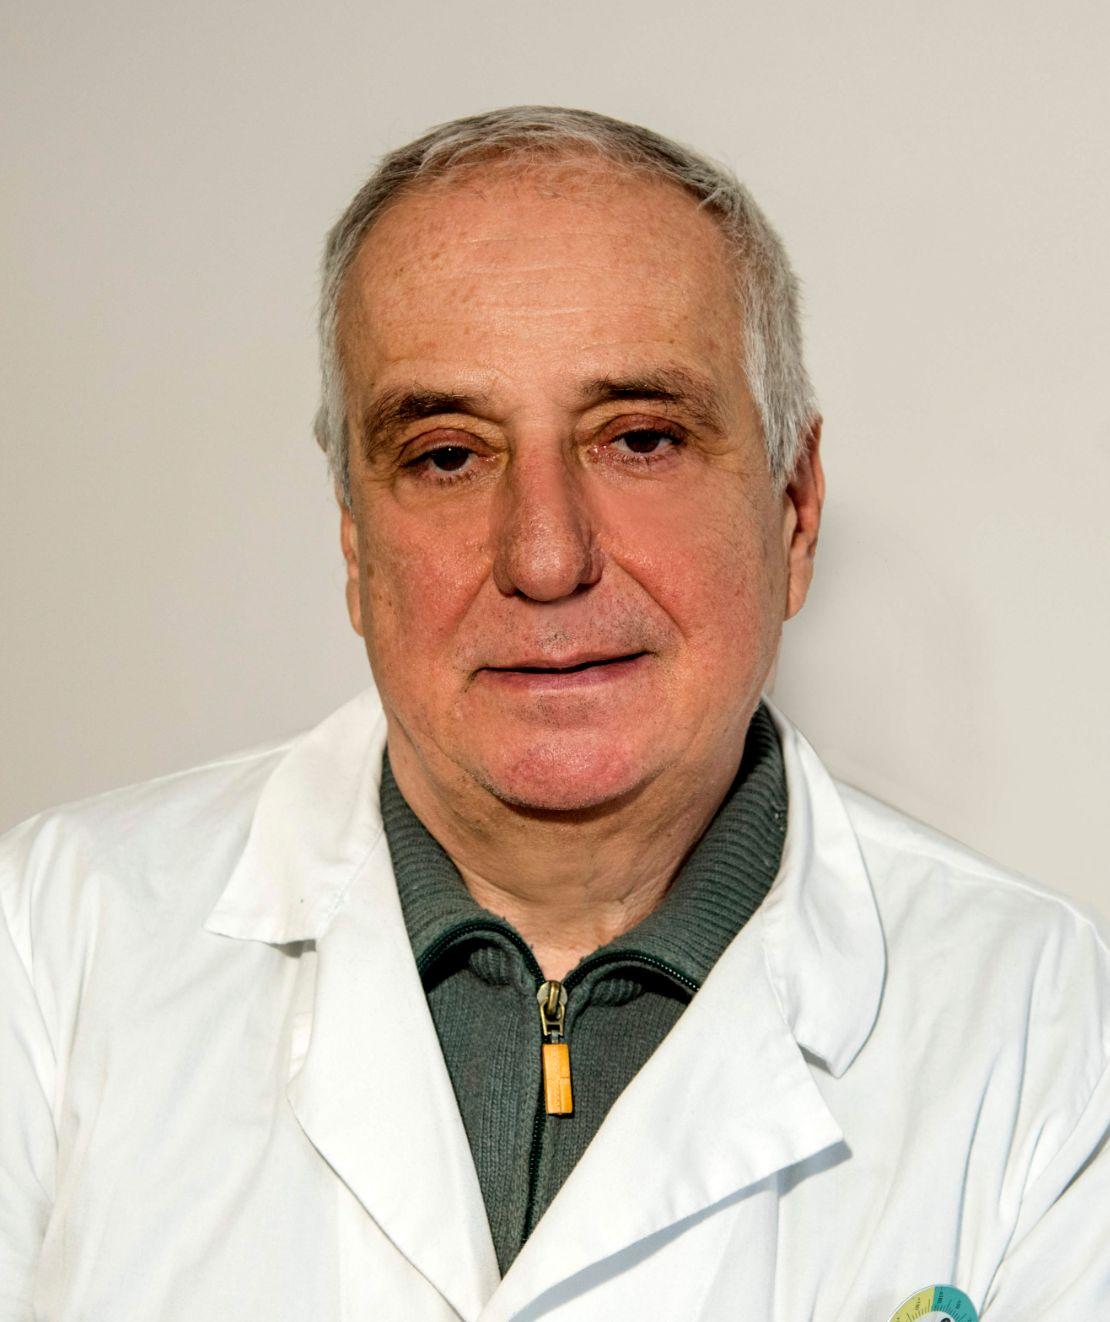 Alberto Lazzaroni